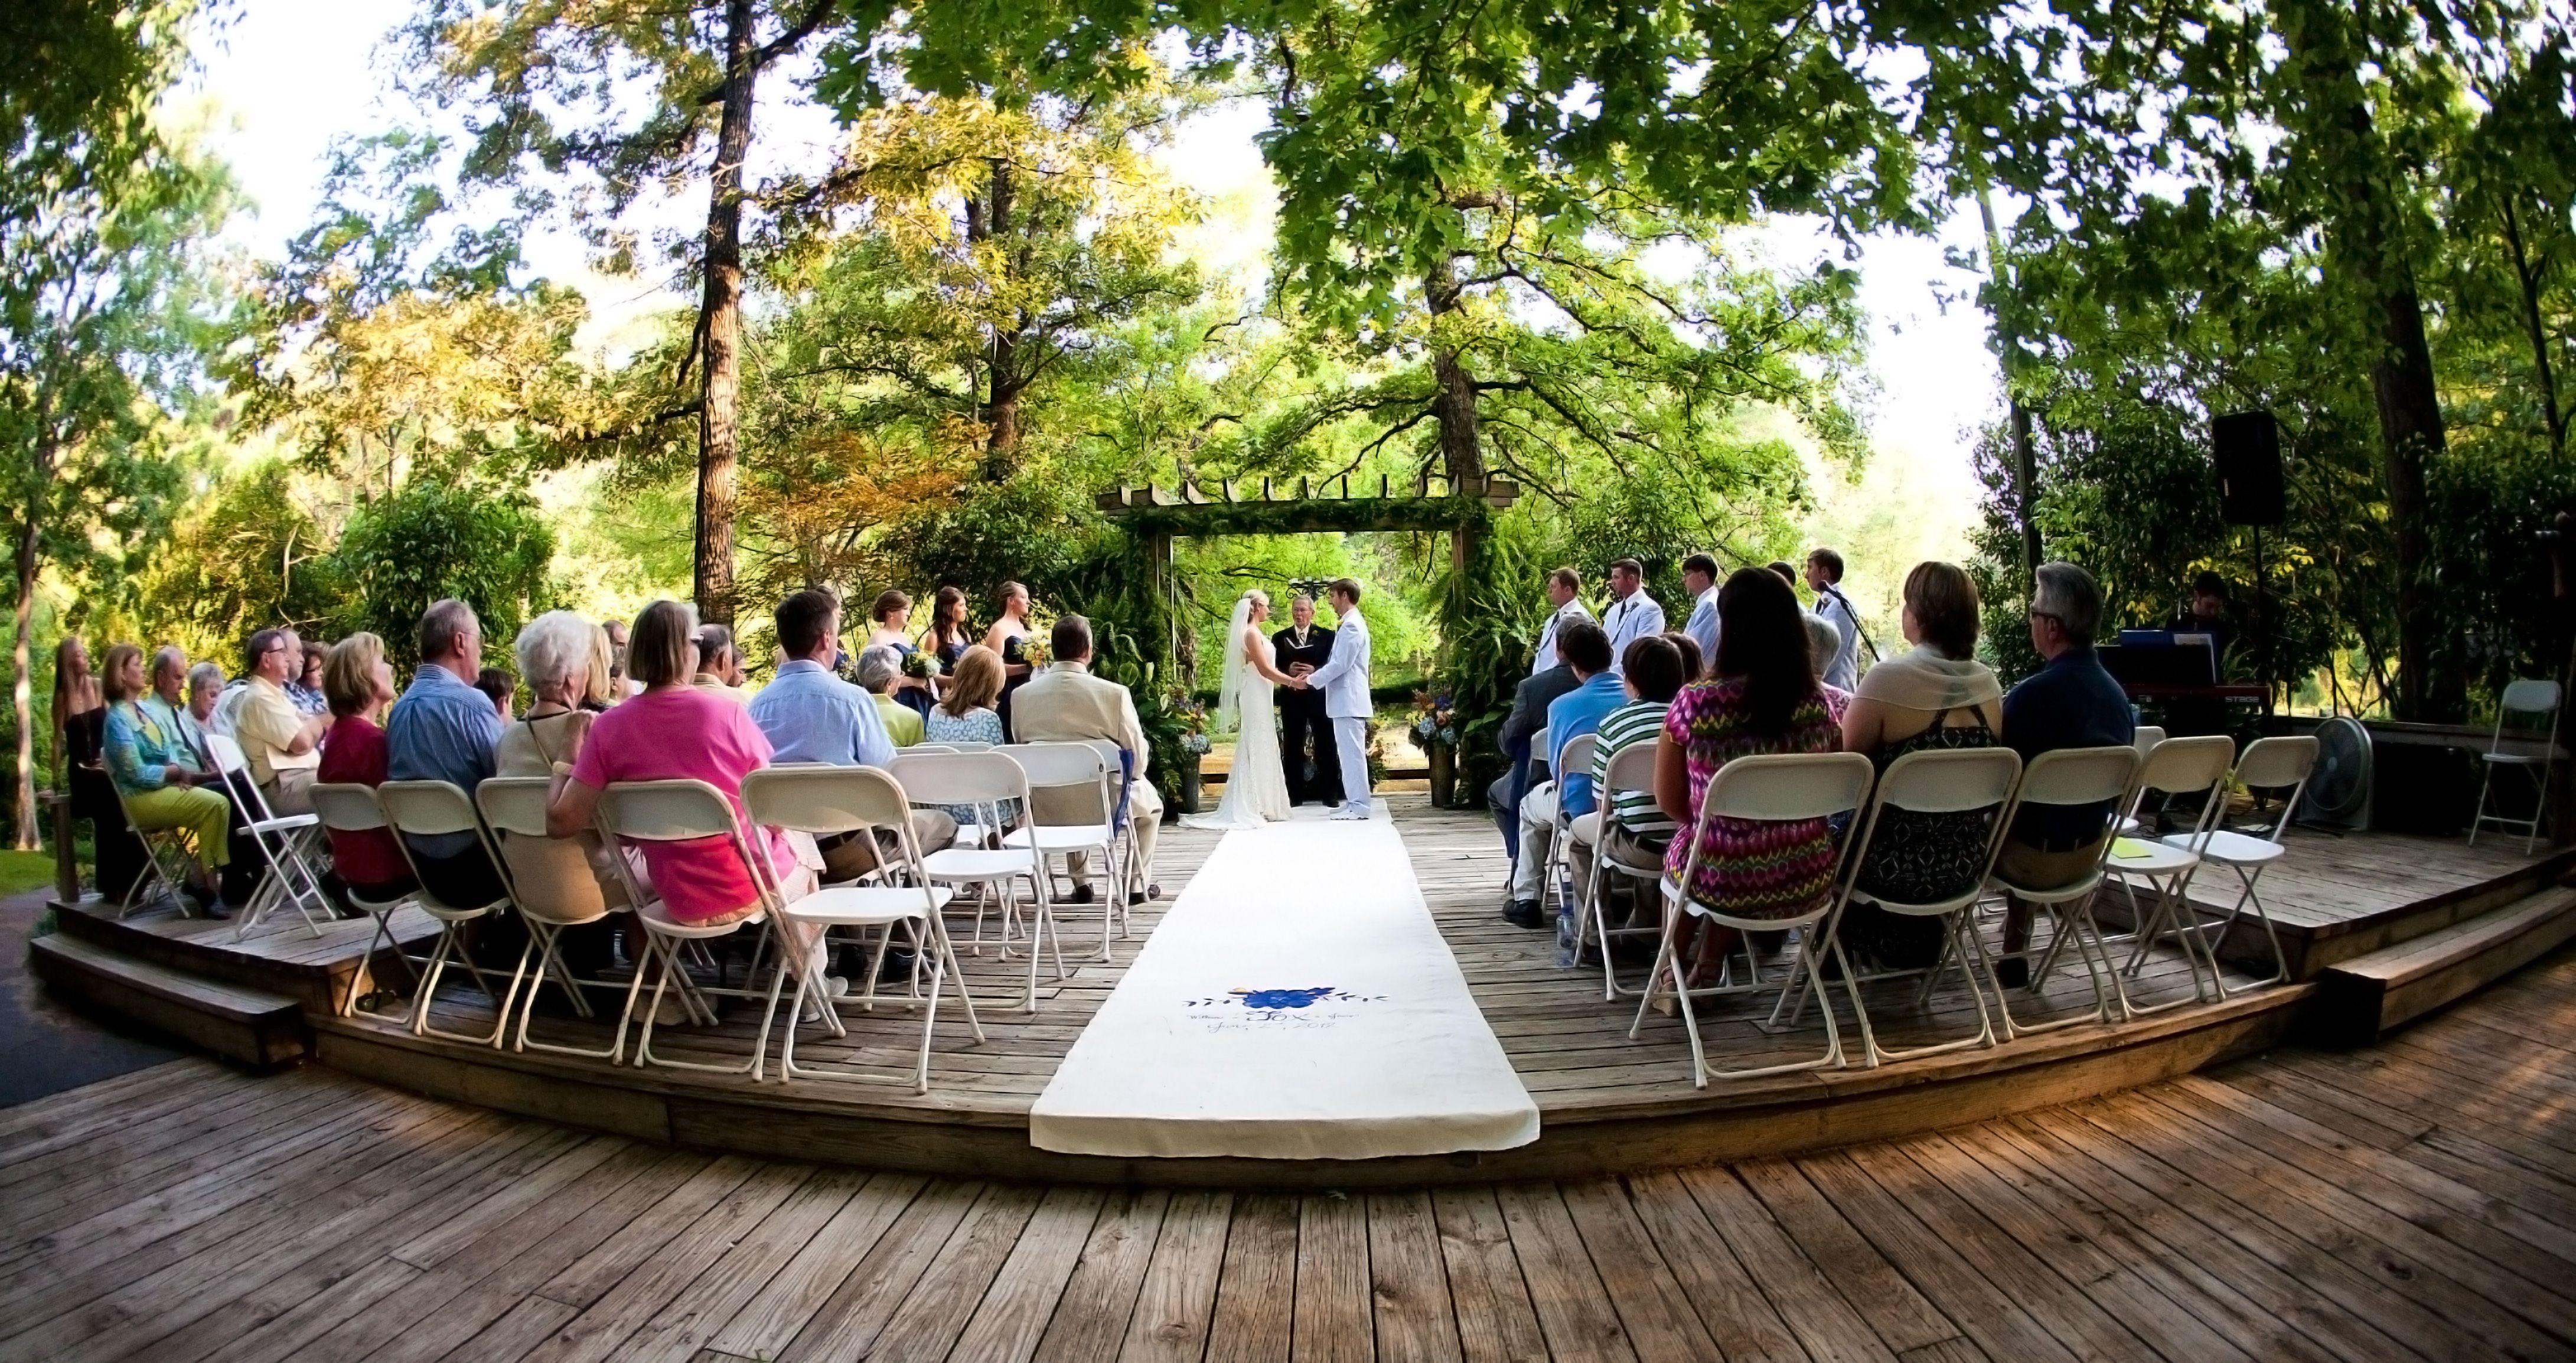 Find Wedding Venues Northwest Arkansas At Avondale Chapel And Gardens Creekwood Holiday Inn Springdale AR The Old Mill NJ Pinnacle